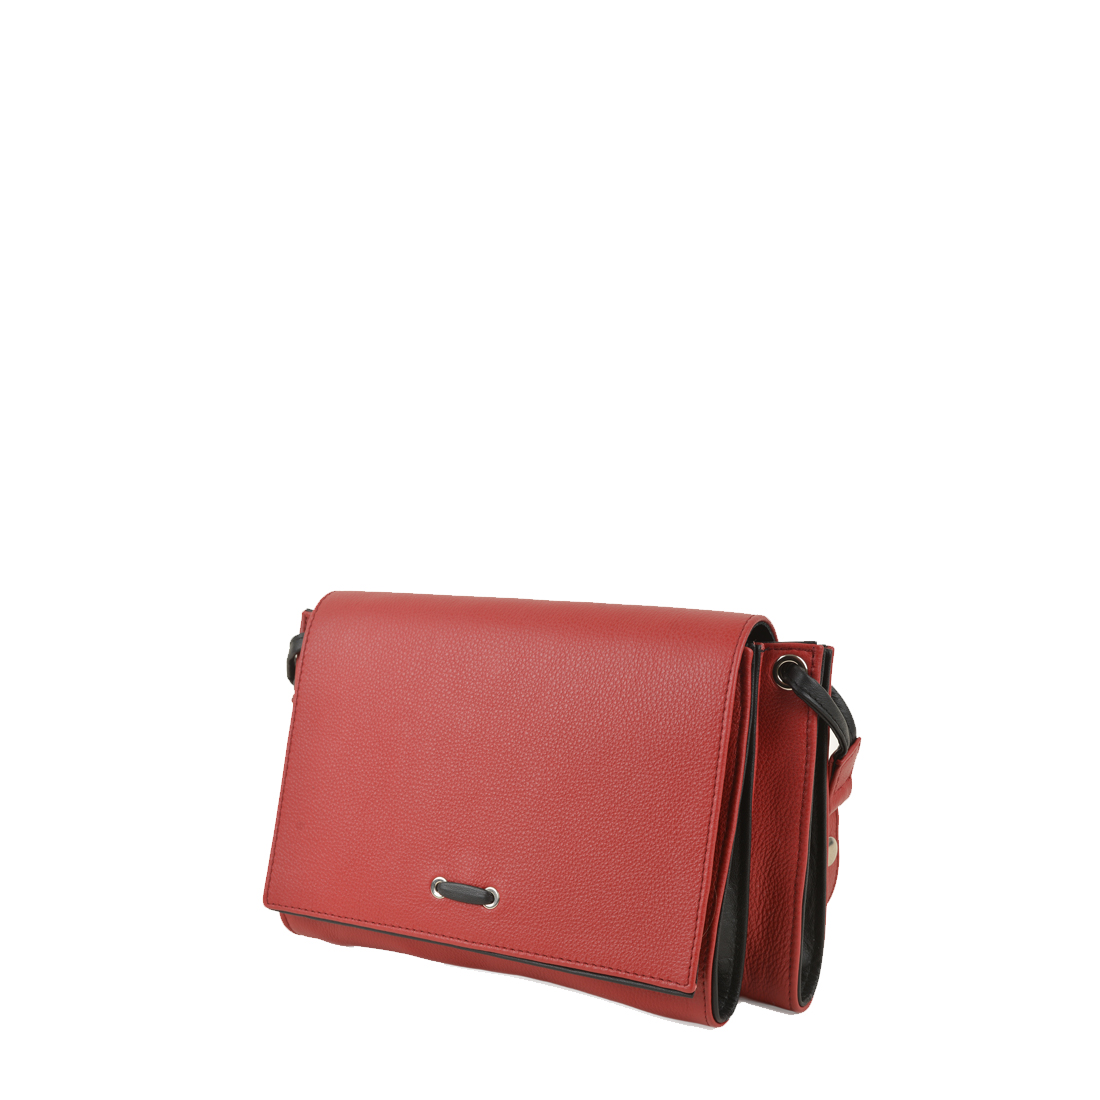 Isobel Red / Black Leather Across Body Bag